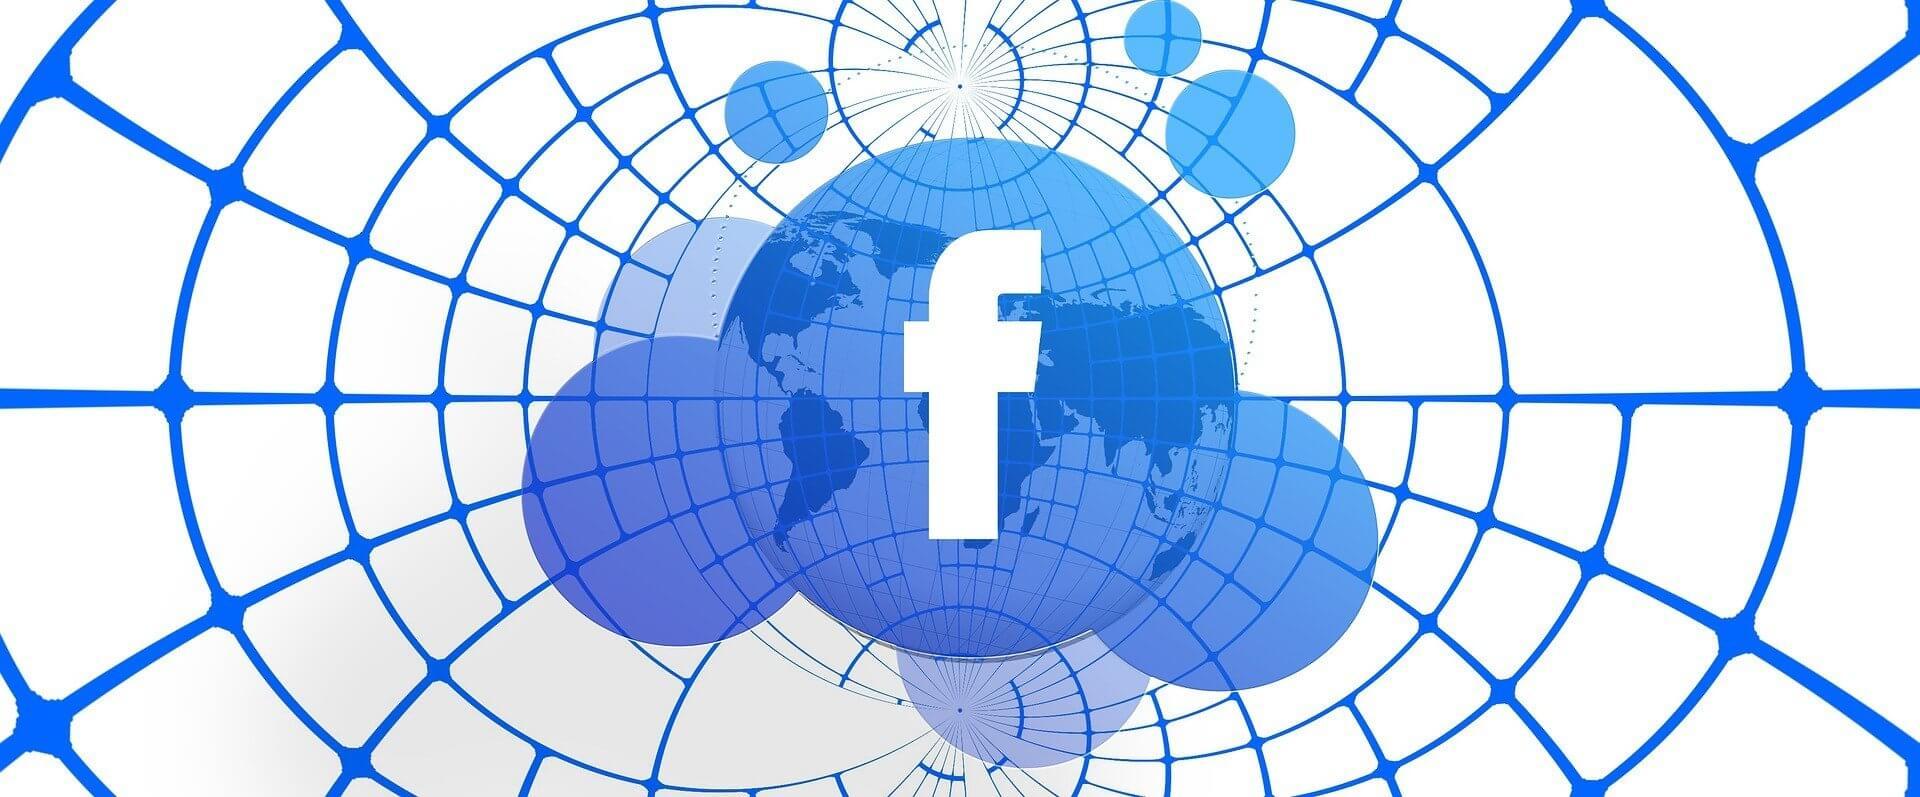 facebook logo on net background